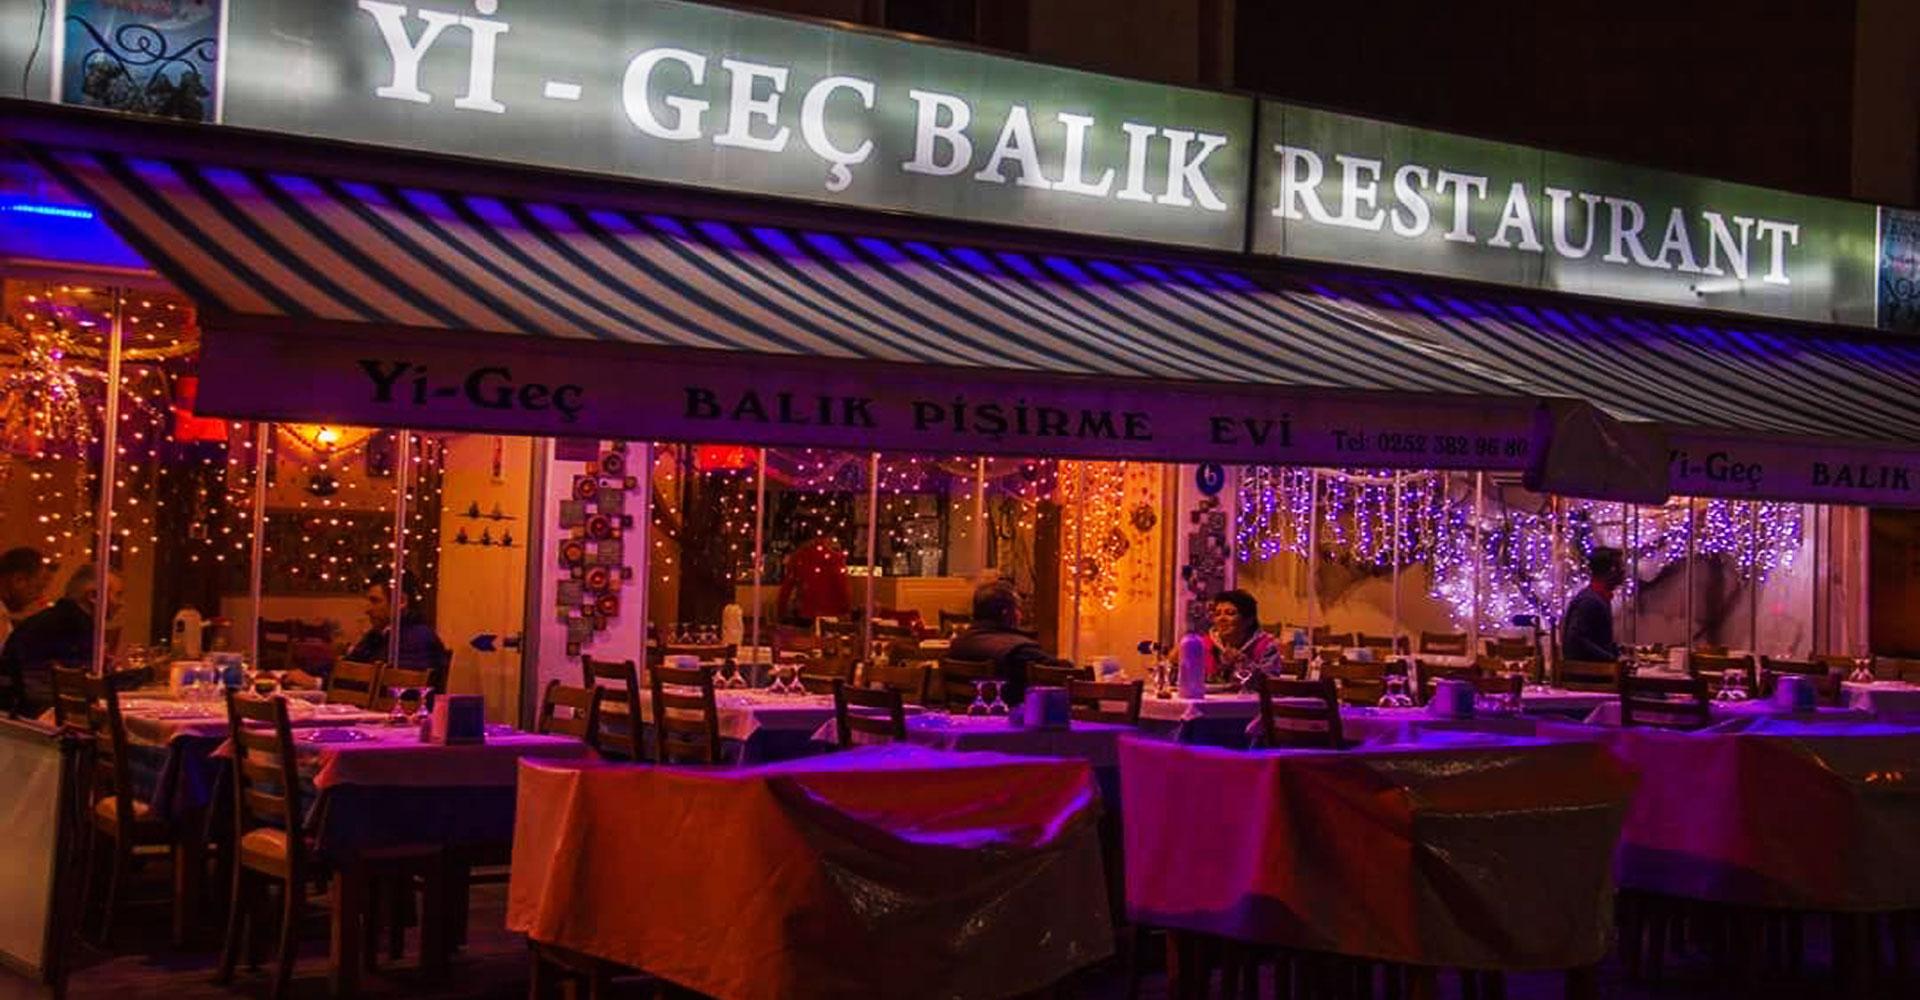 Yigeç Restaurant